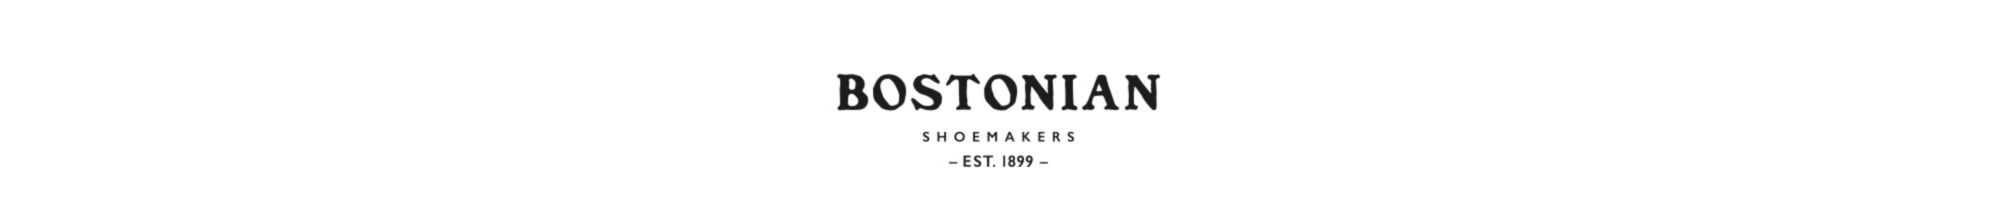 Bostonian Logo